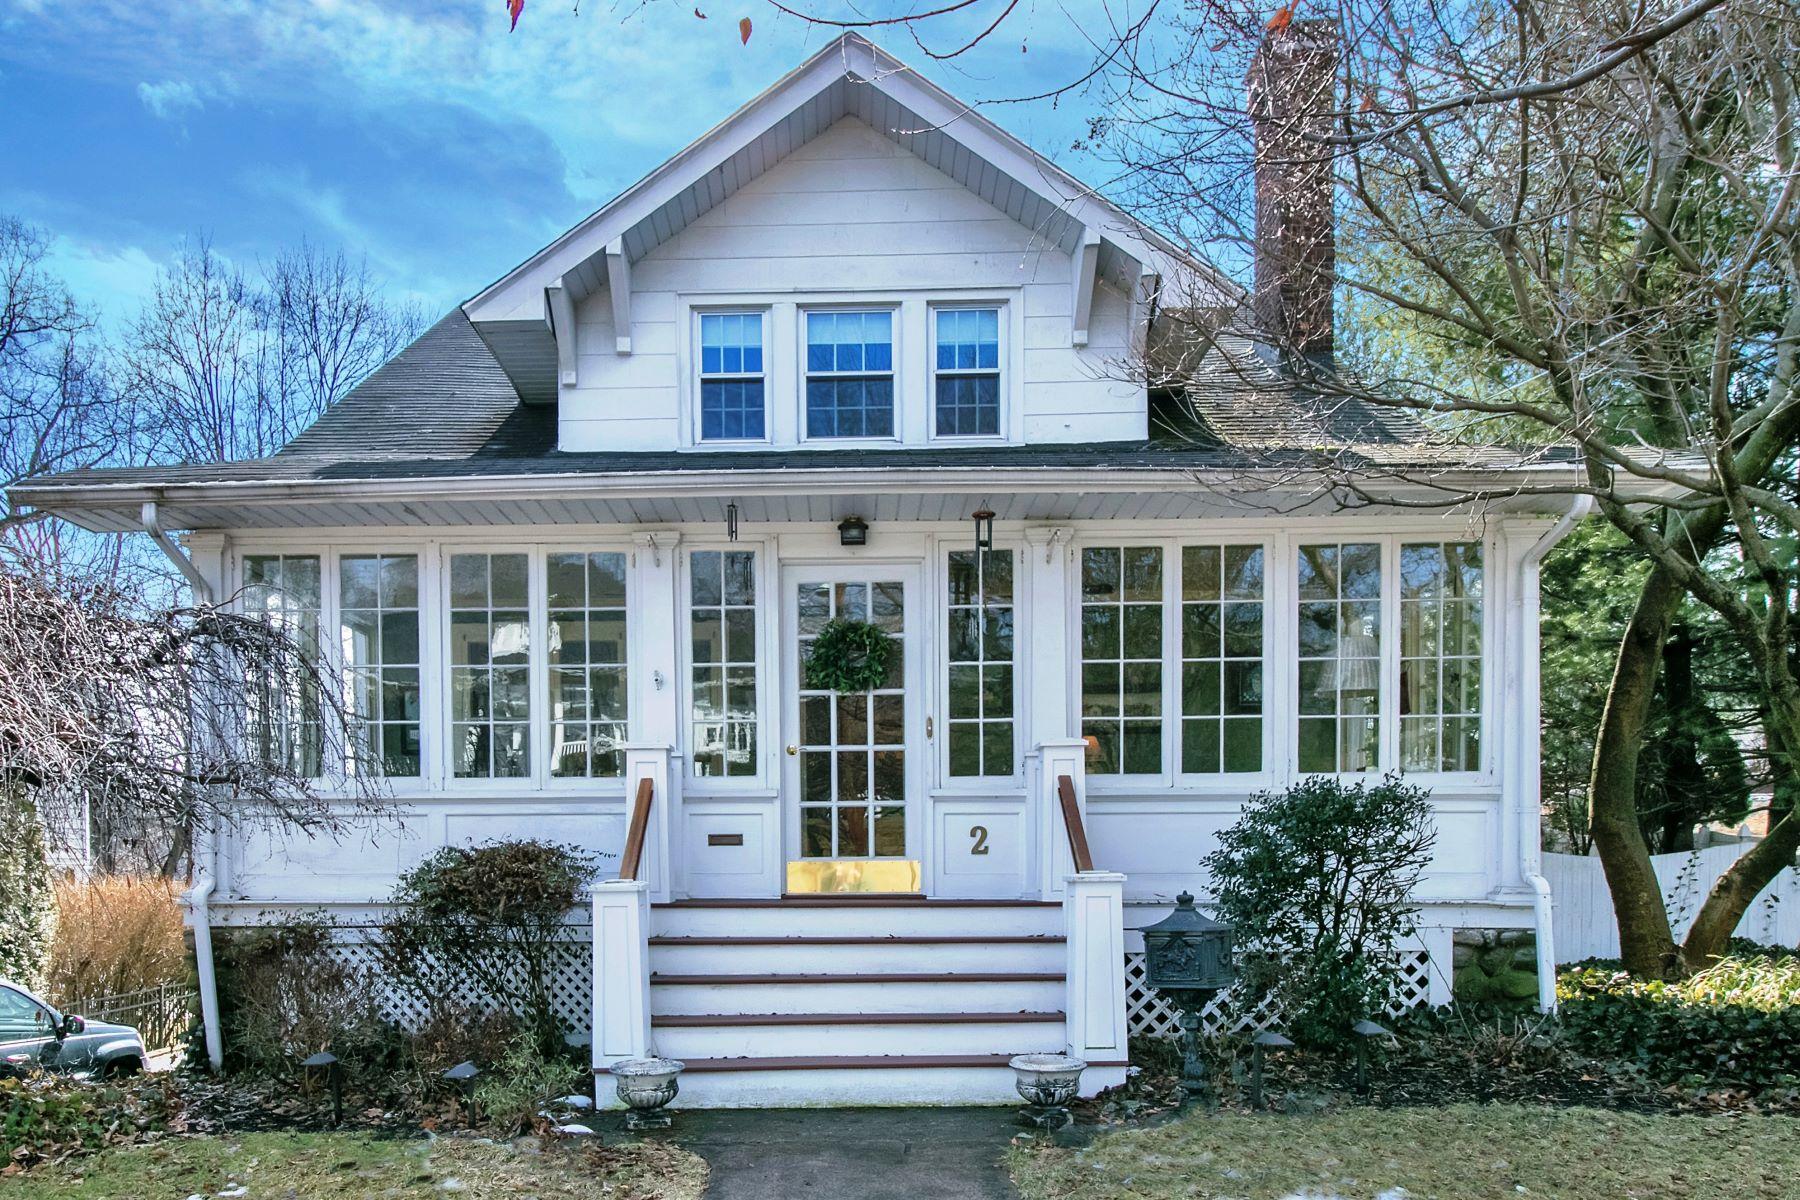 独户住宅 为 销售 在 Charming And Fully Updated Colonial. A Commuter's Dream. 2 Rock Road, 格伦洛克, 新泽西州, 07452 美国